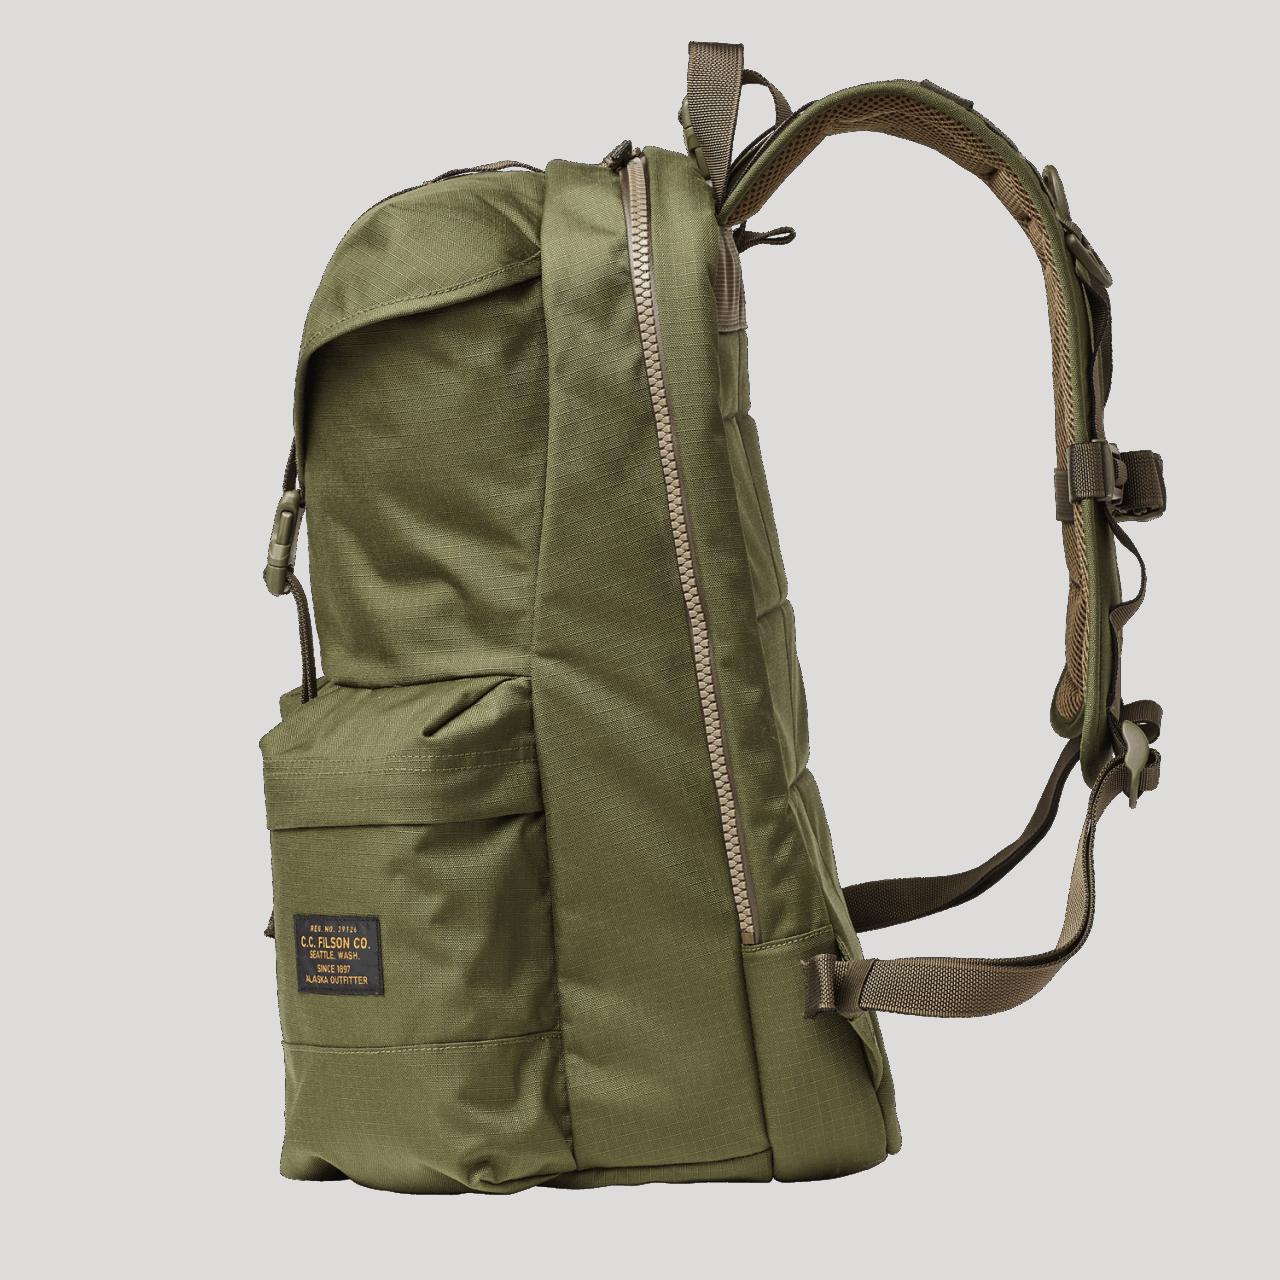 Filson Ripstop Nylon Backpack 32l - surplus green